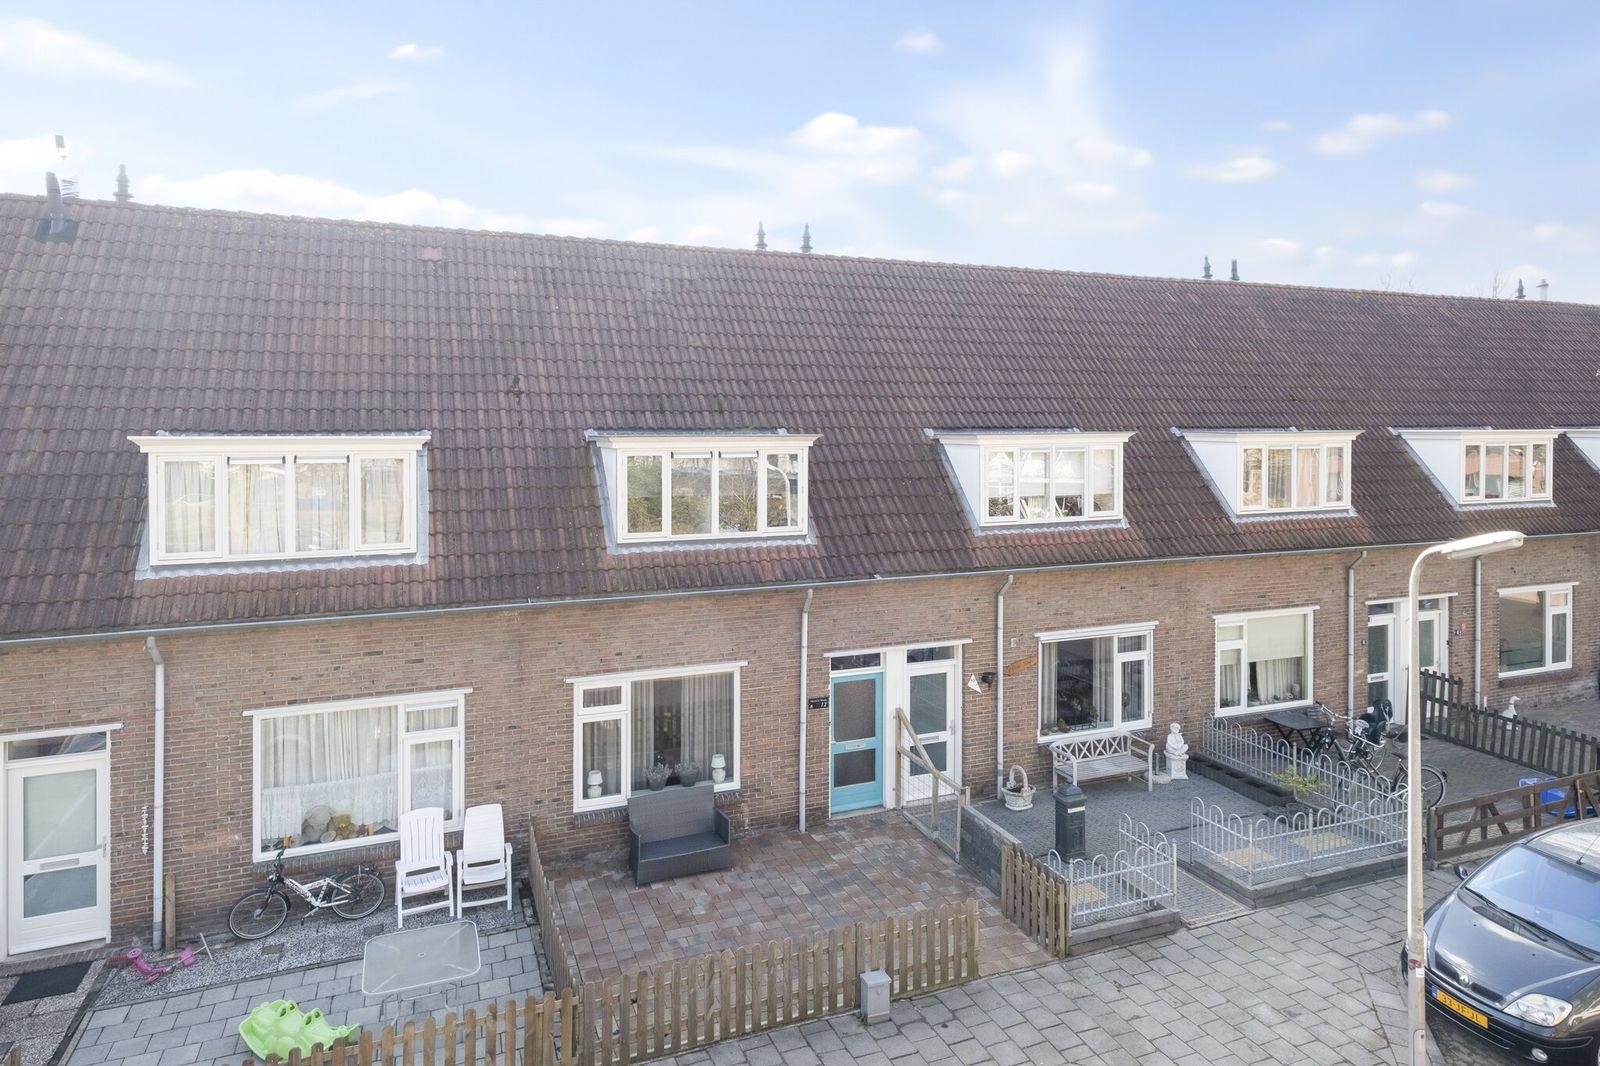 Duivenslagstraat 12, Hoogeveen